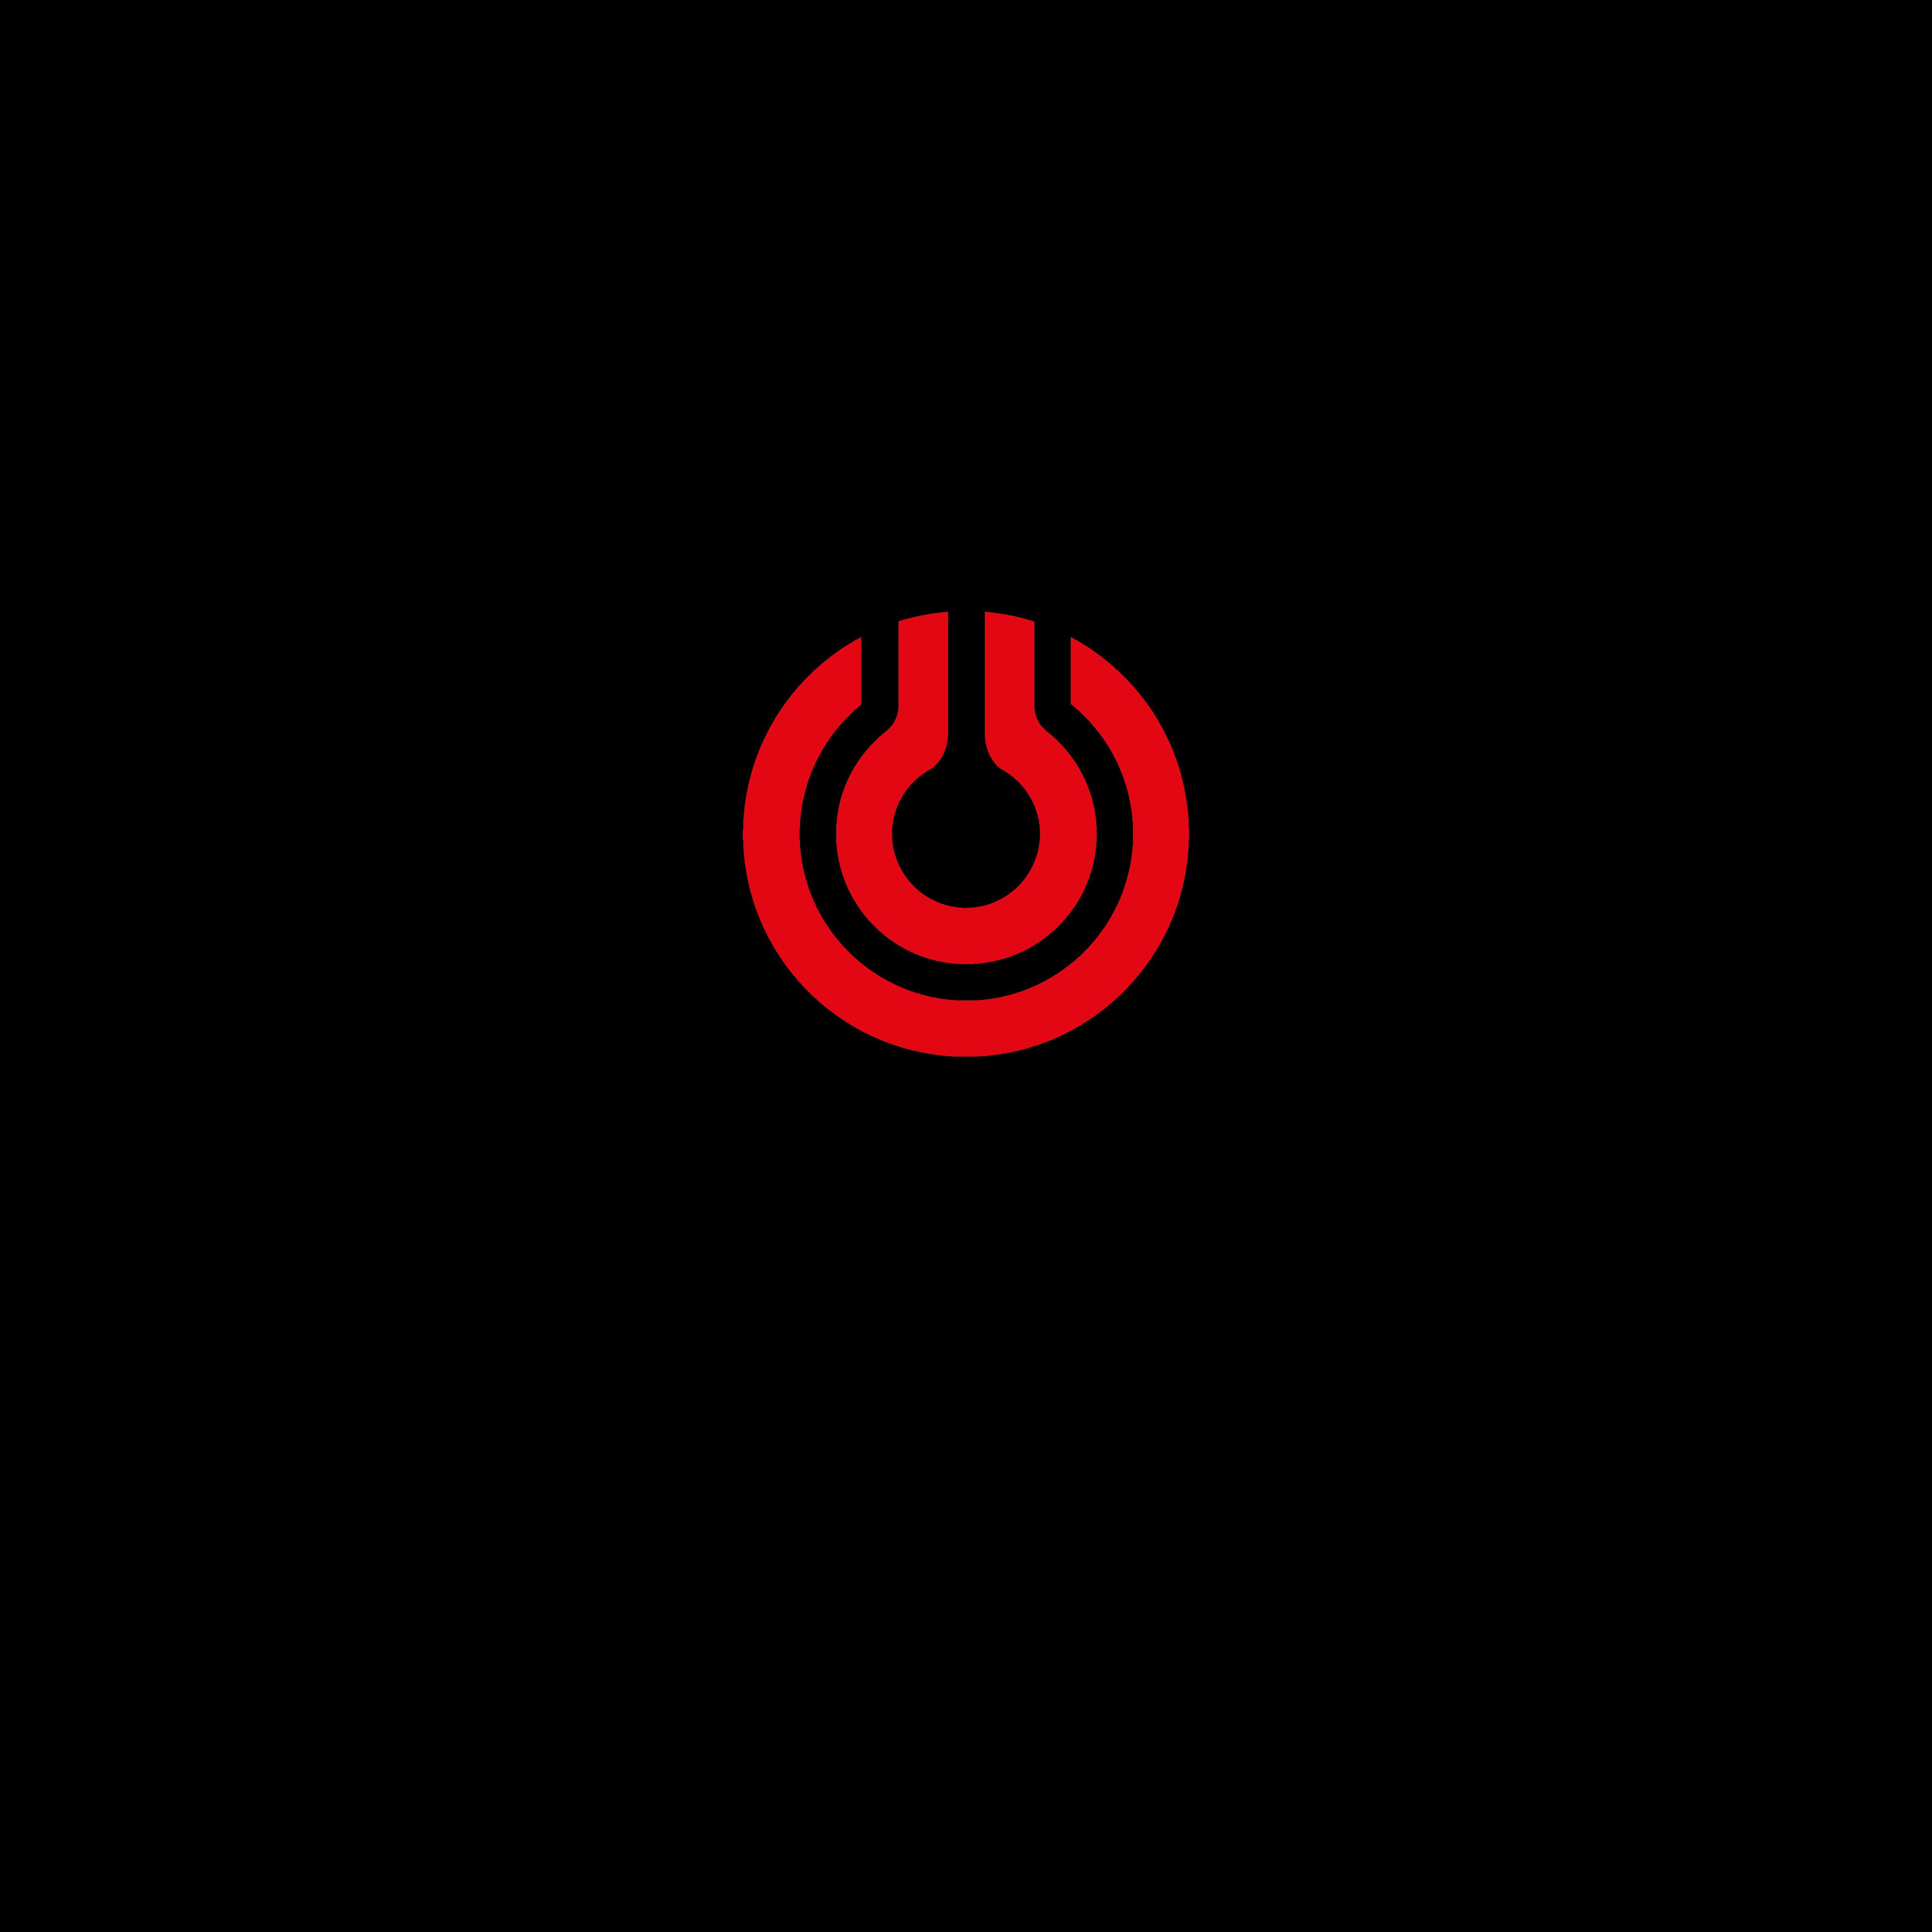 shv energy logo 0 - SHV Energy Logo